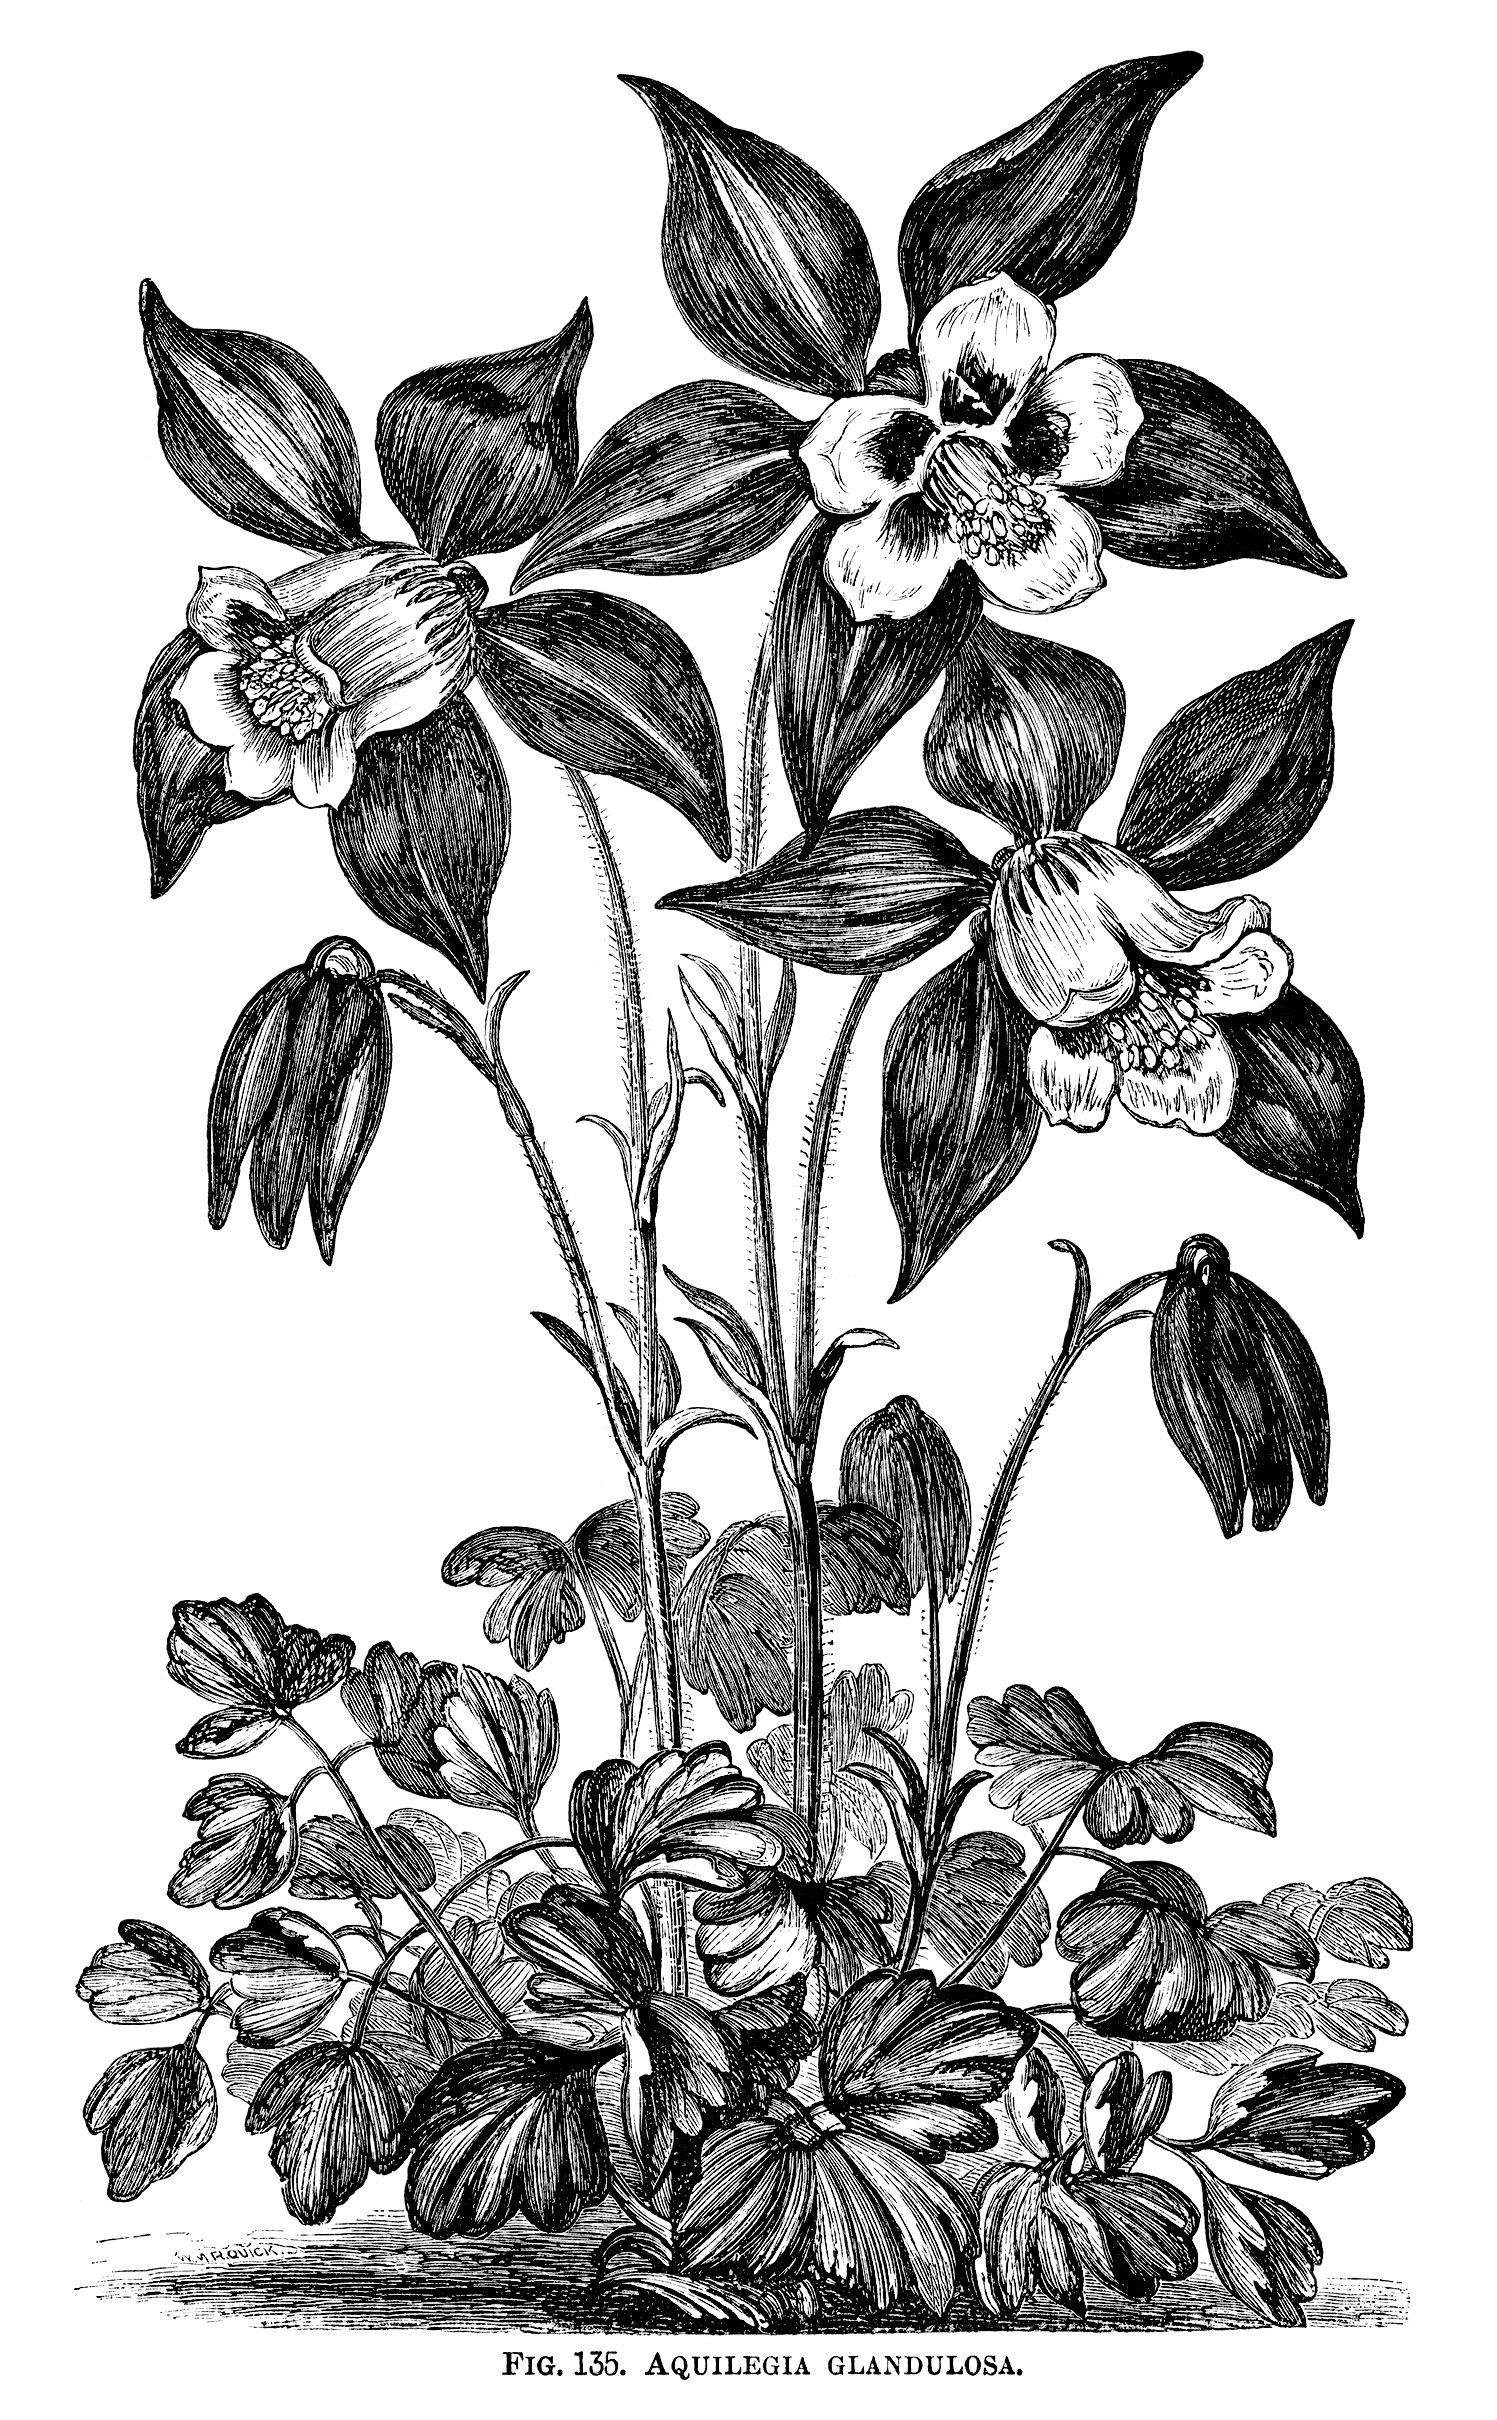 Flower Shop Interior Graphic Black White Sketch Illustration Vector Stock  Vector - Illustration of black, curtain: 119877618